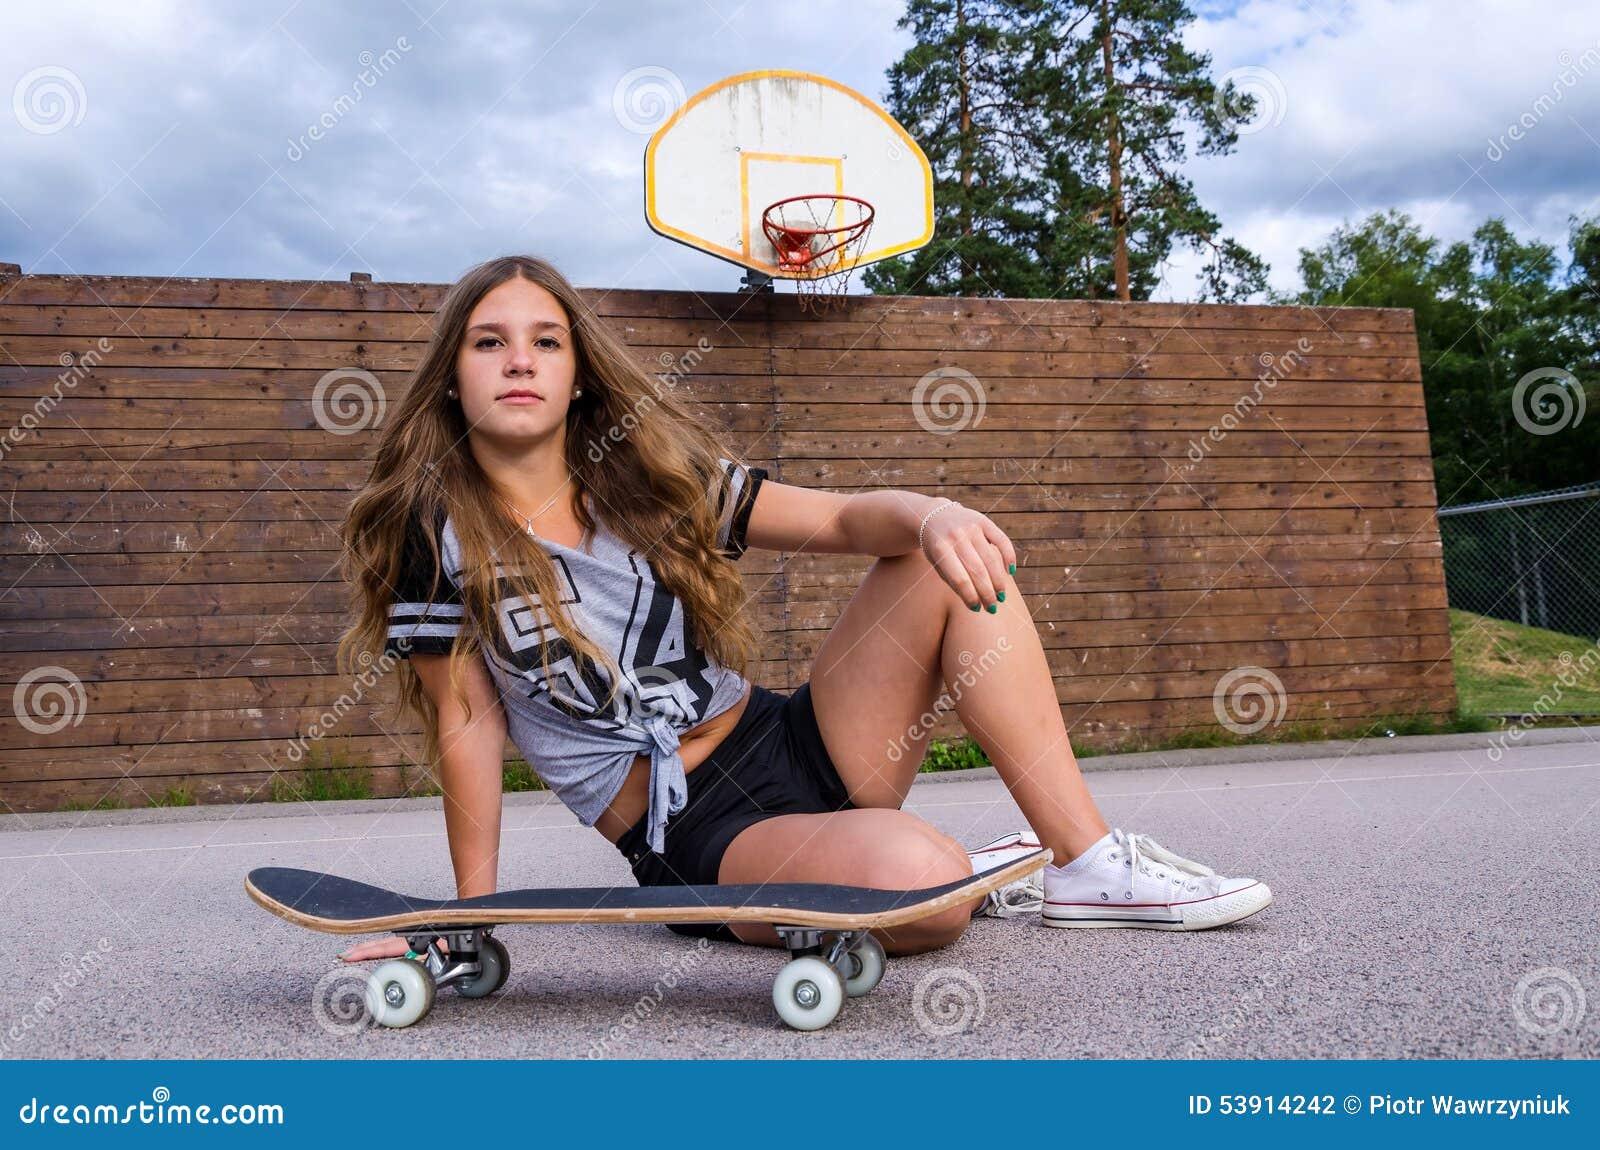 Teen Girl With Skateboard Stock Photo - Image: 53914242